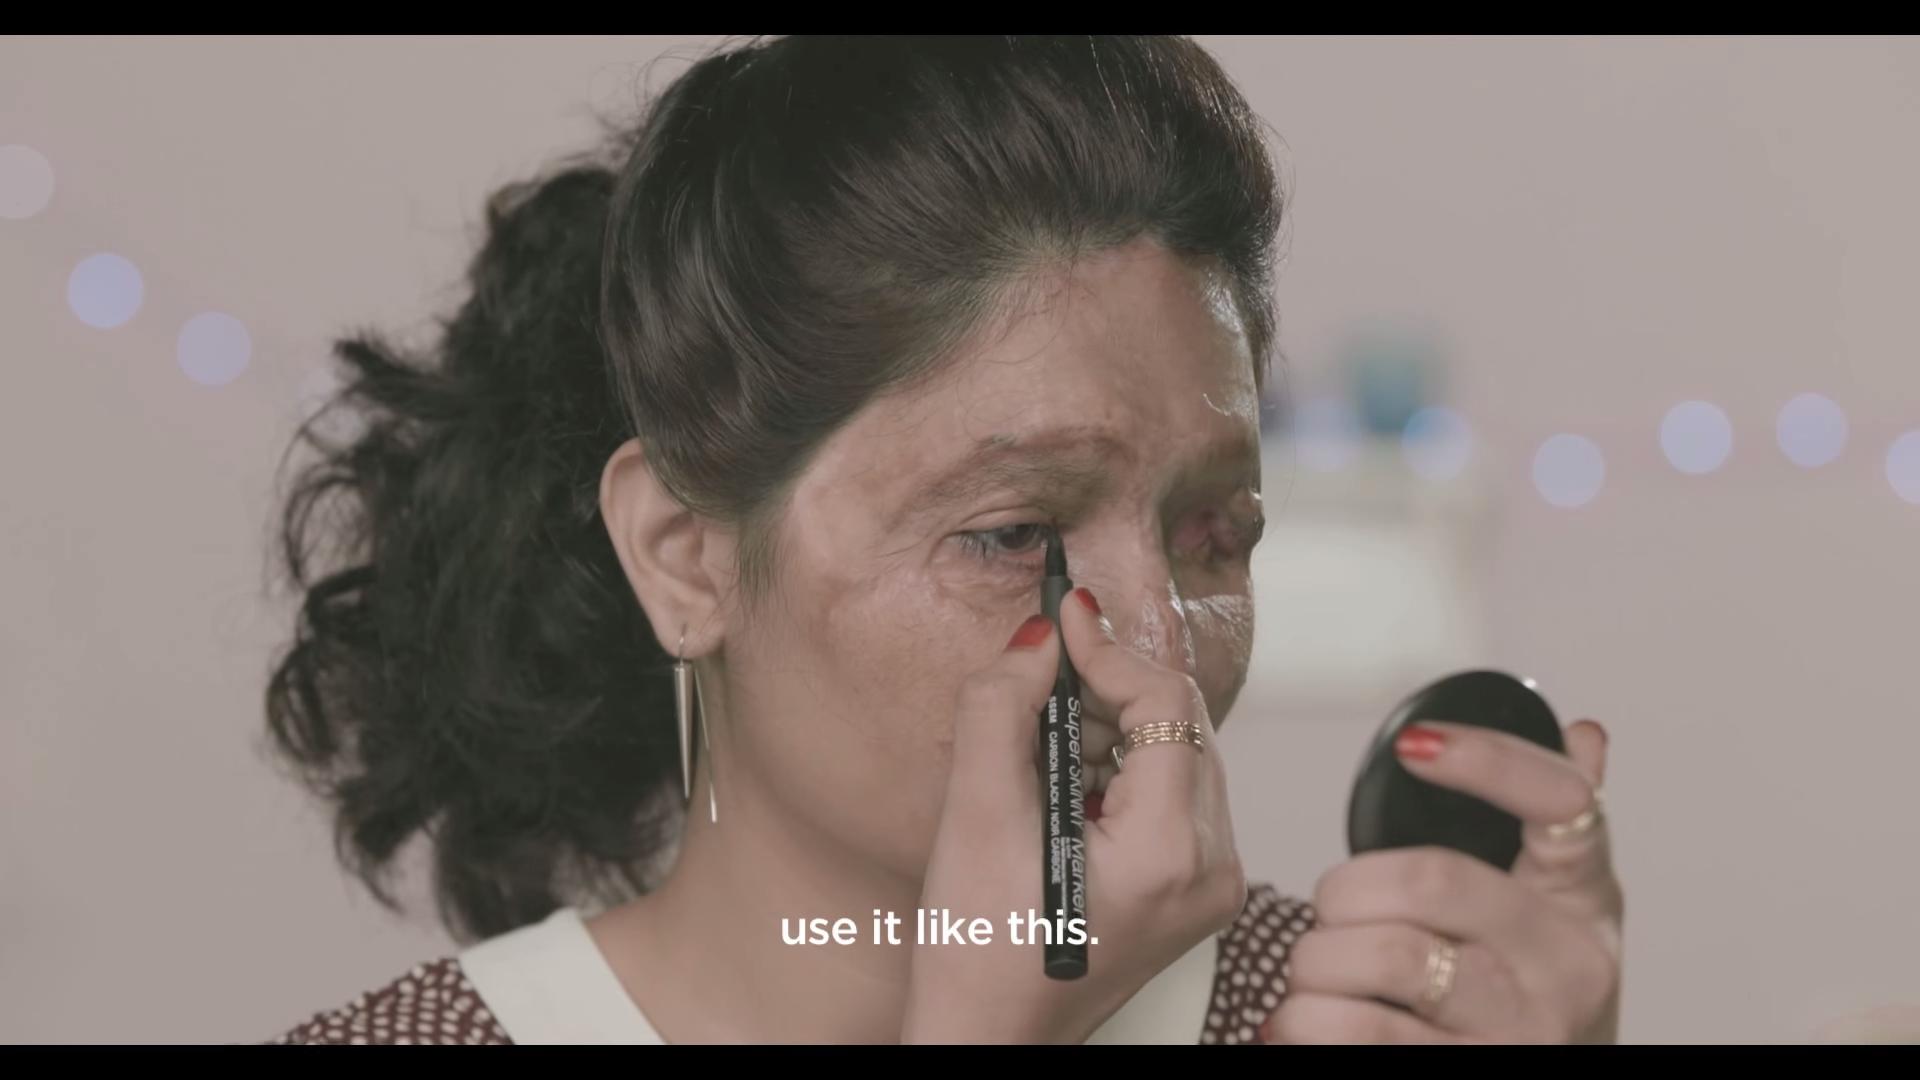 prohibir venta acido sulfurico India 10